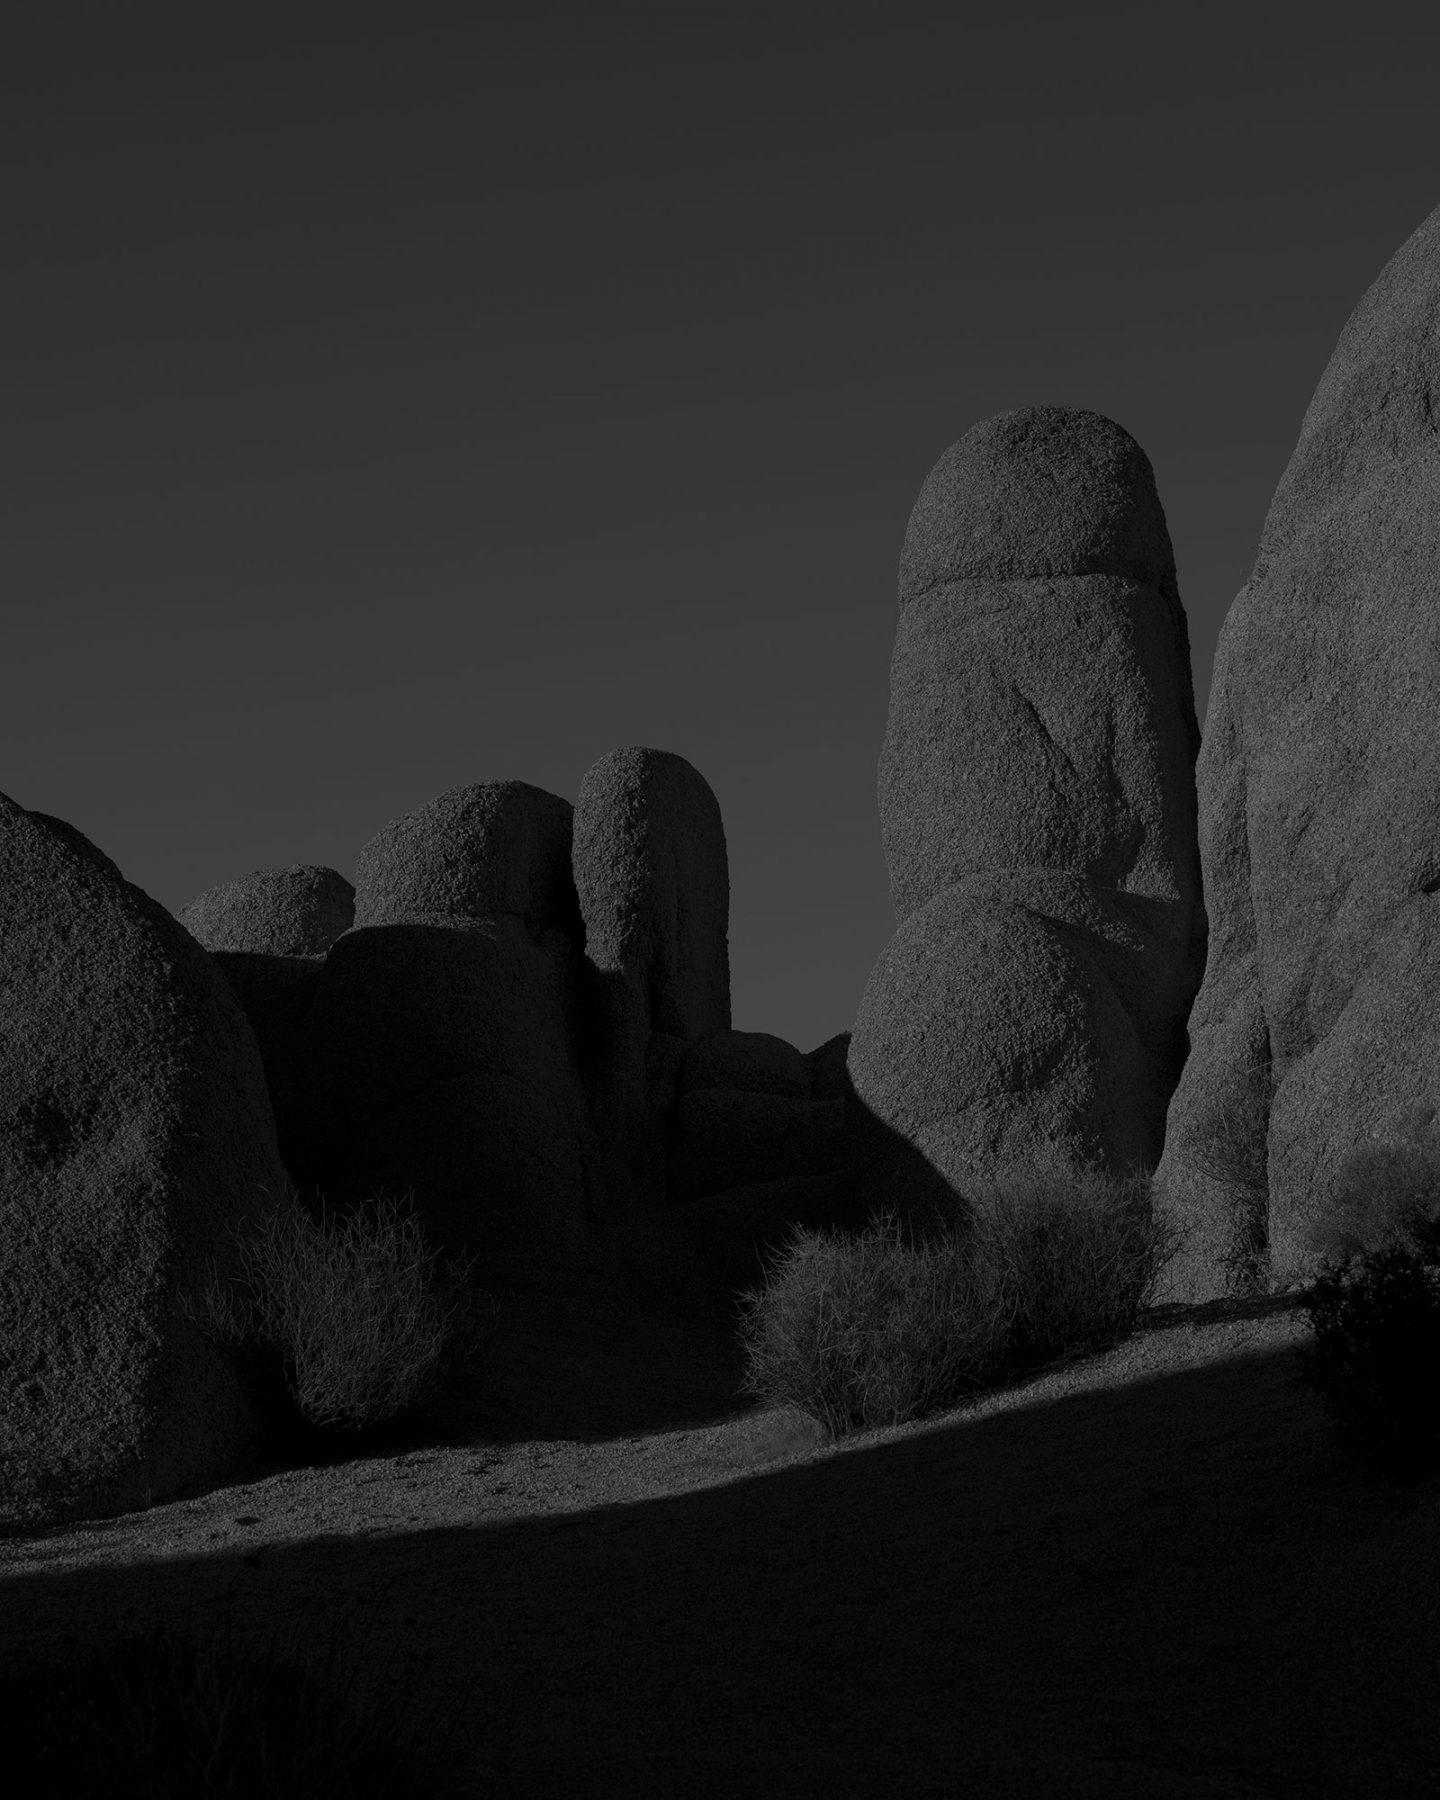 IGNANT-Photography-MarcusSchaefer-13